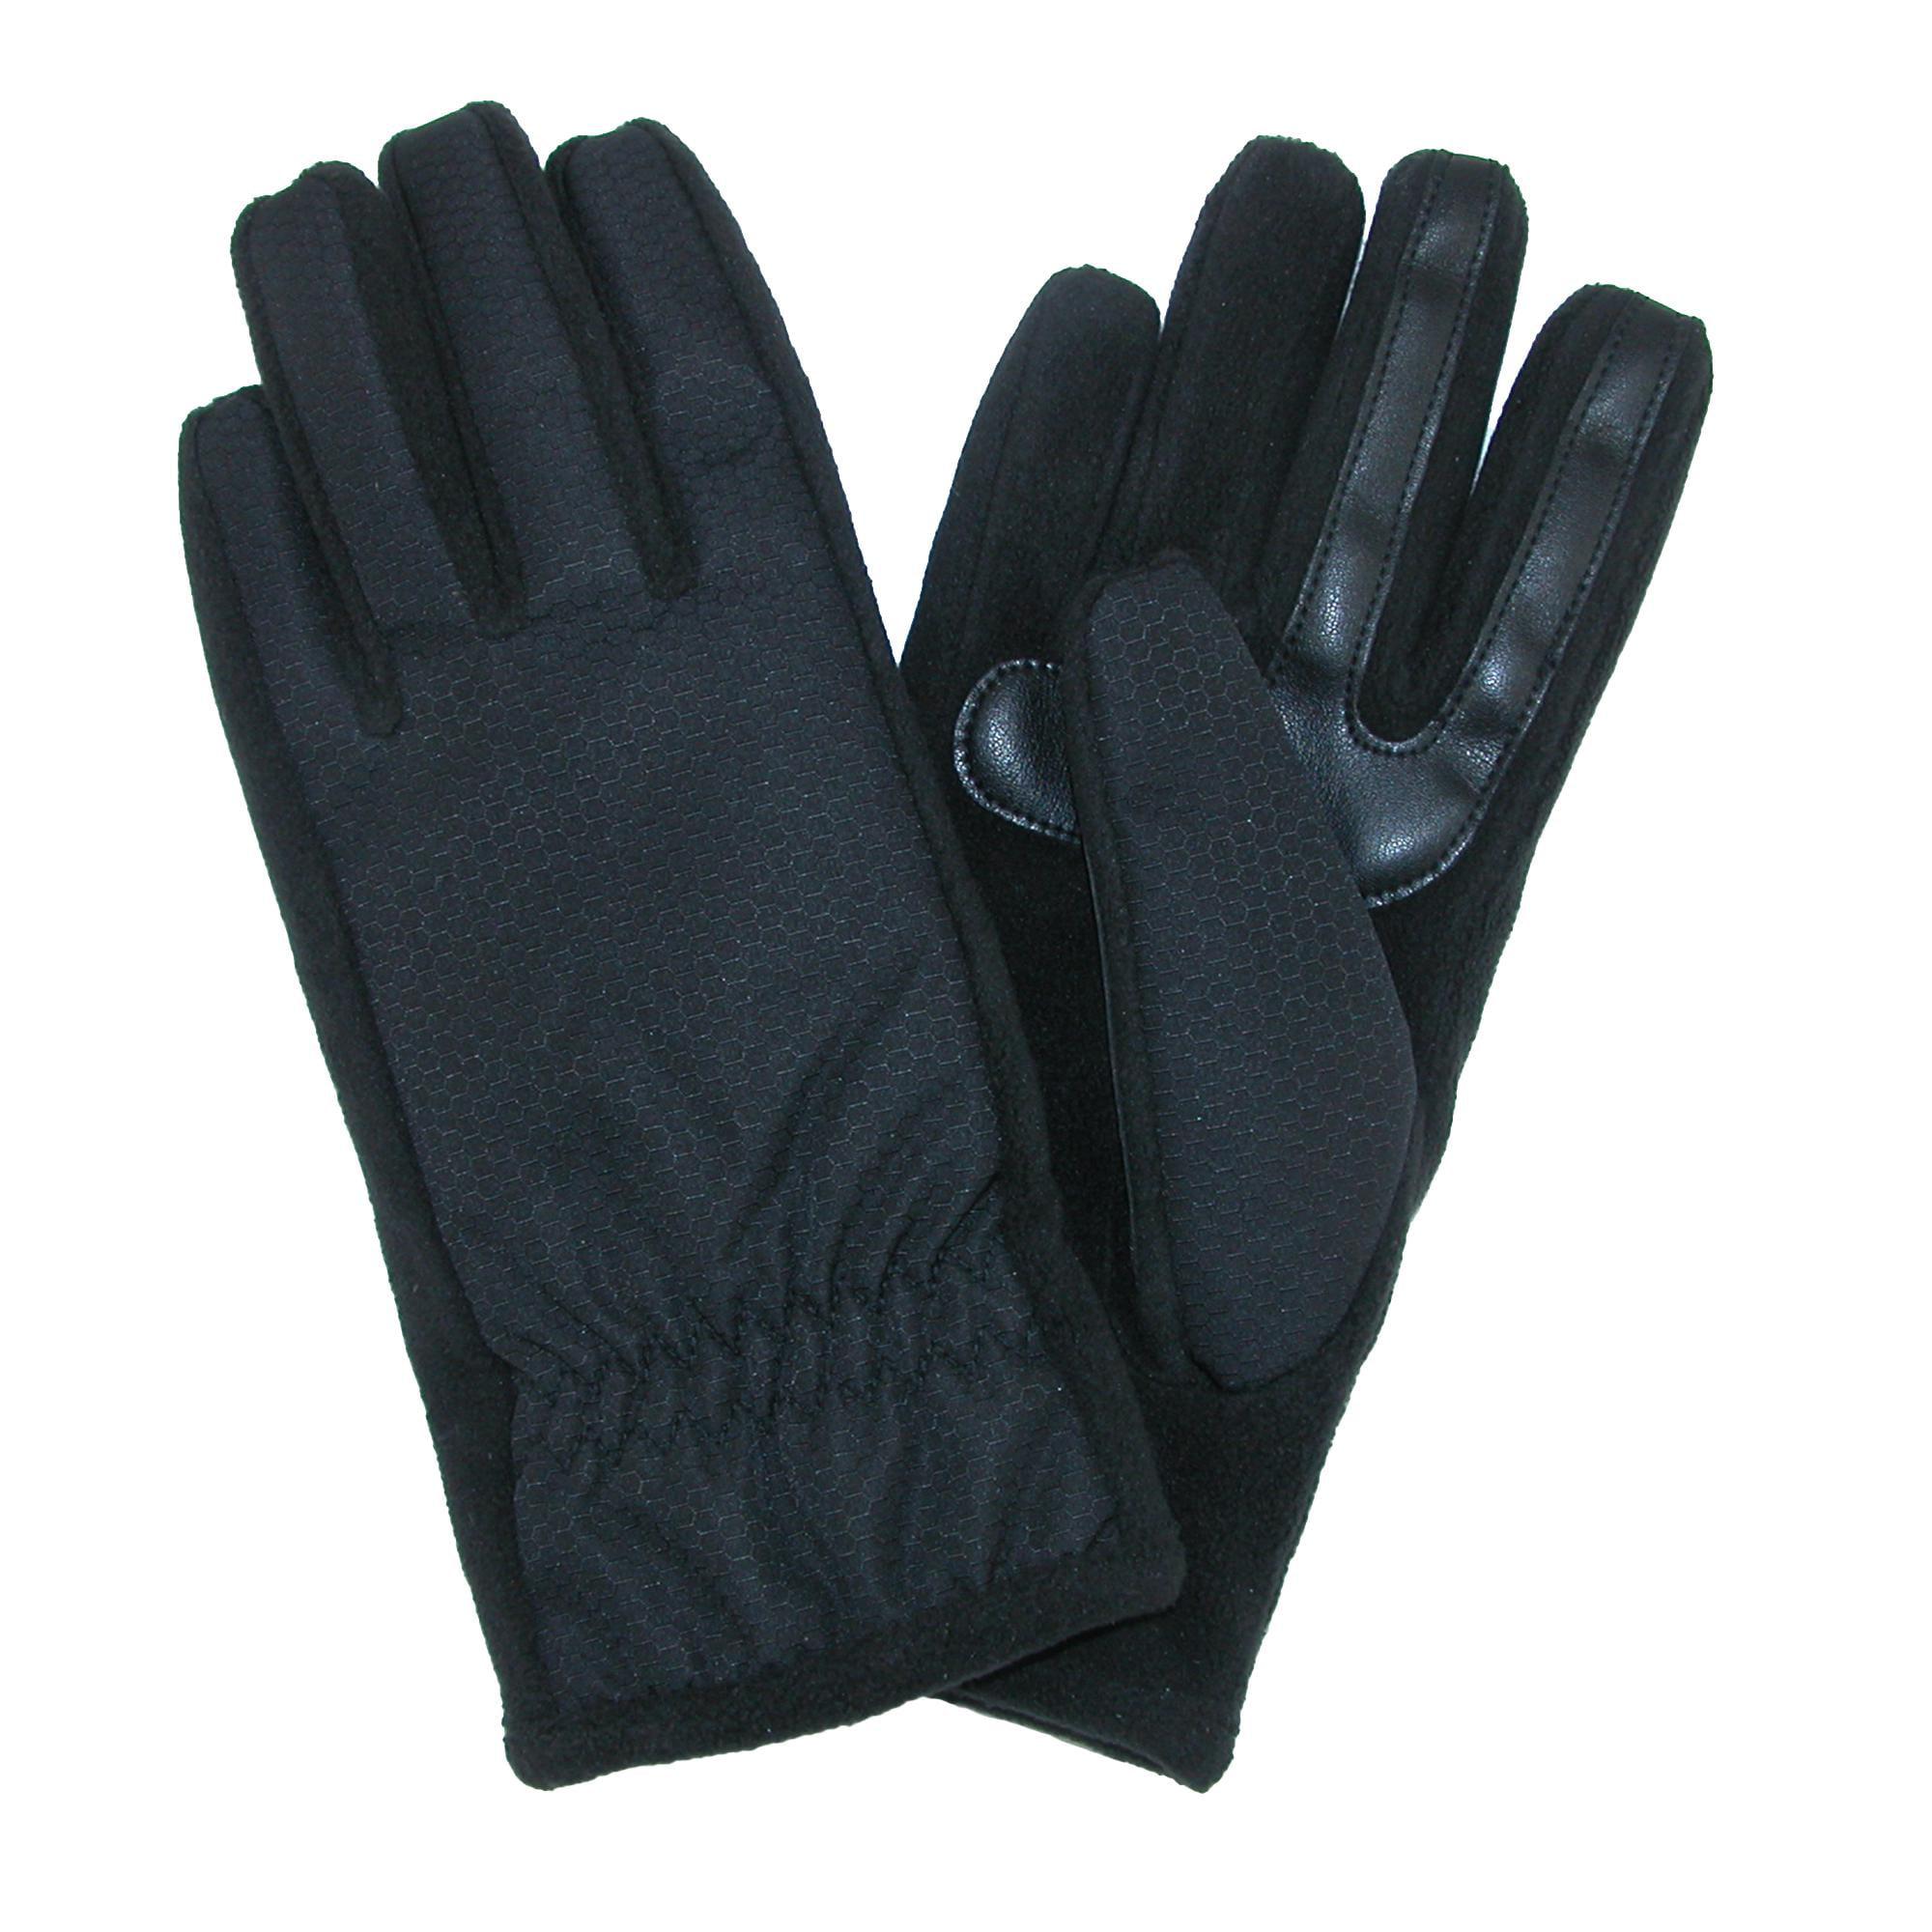 Isotoner  Women's Nylon SmarTouch Winter Texting Gloves